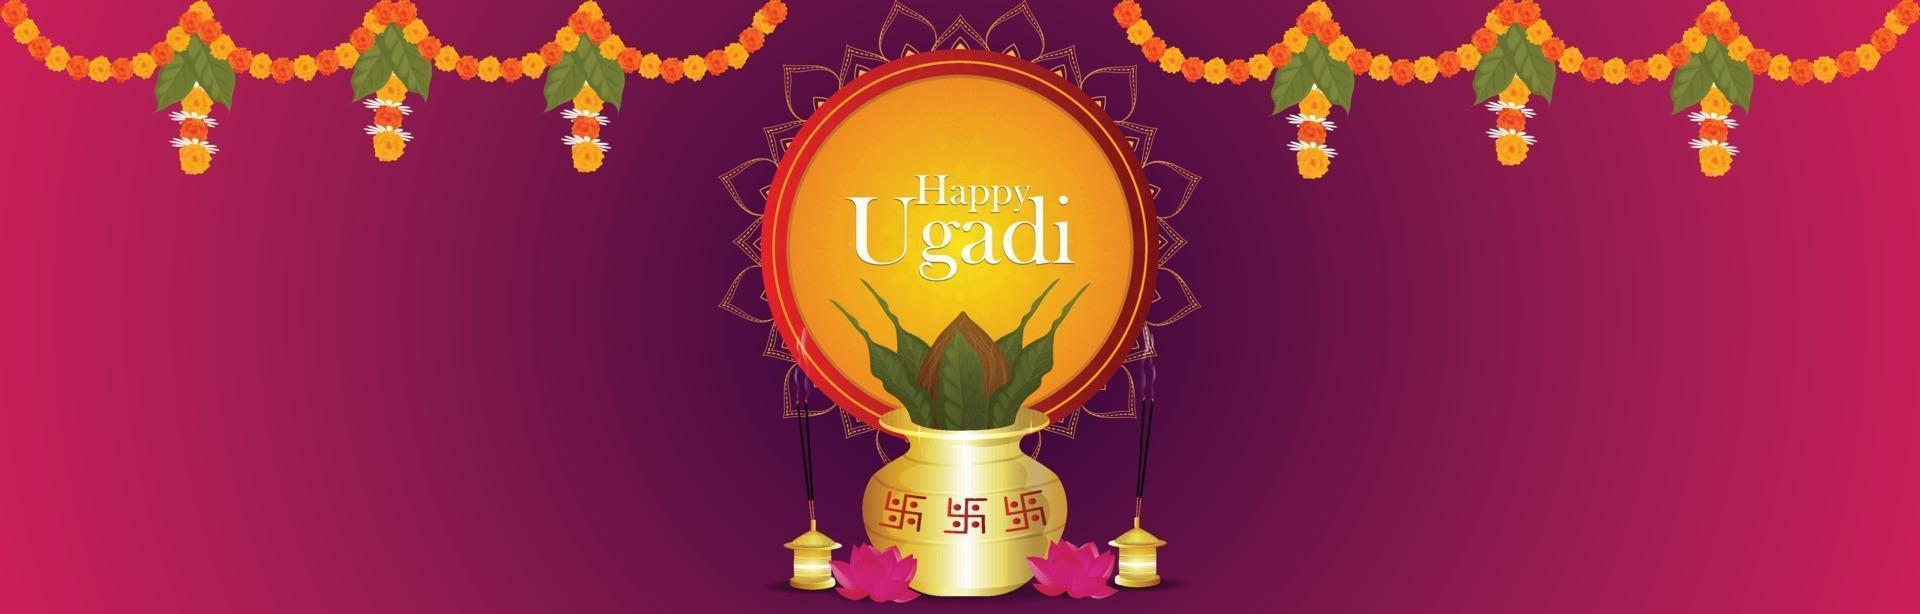 Fröhliches Ugadi. Vorlage Grußkarte traditionelles Festival vektor